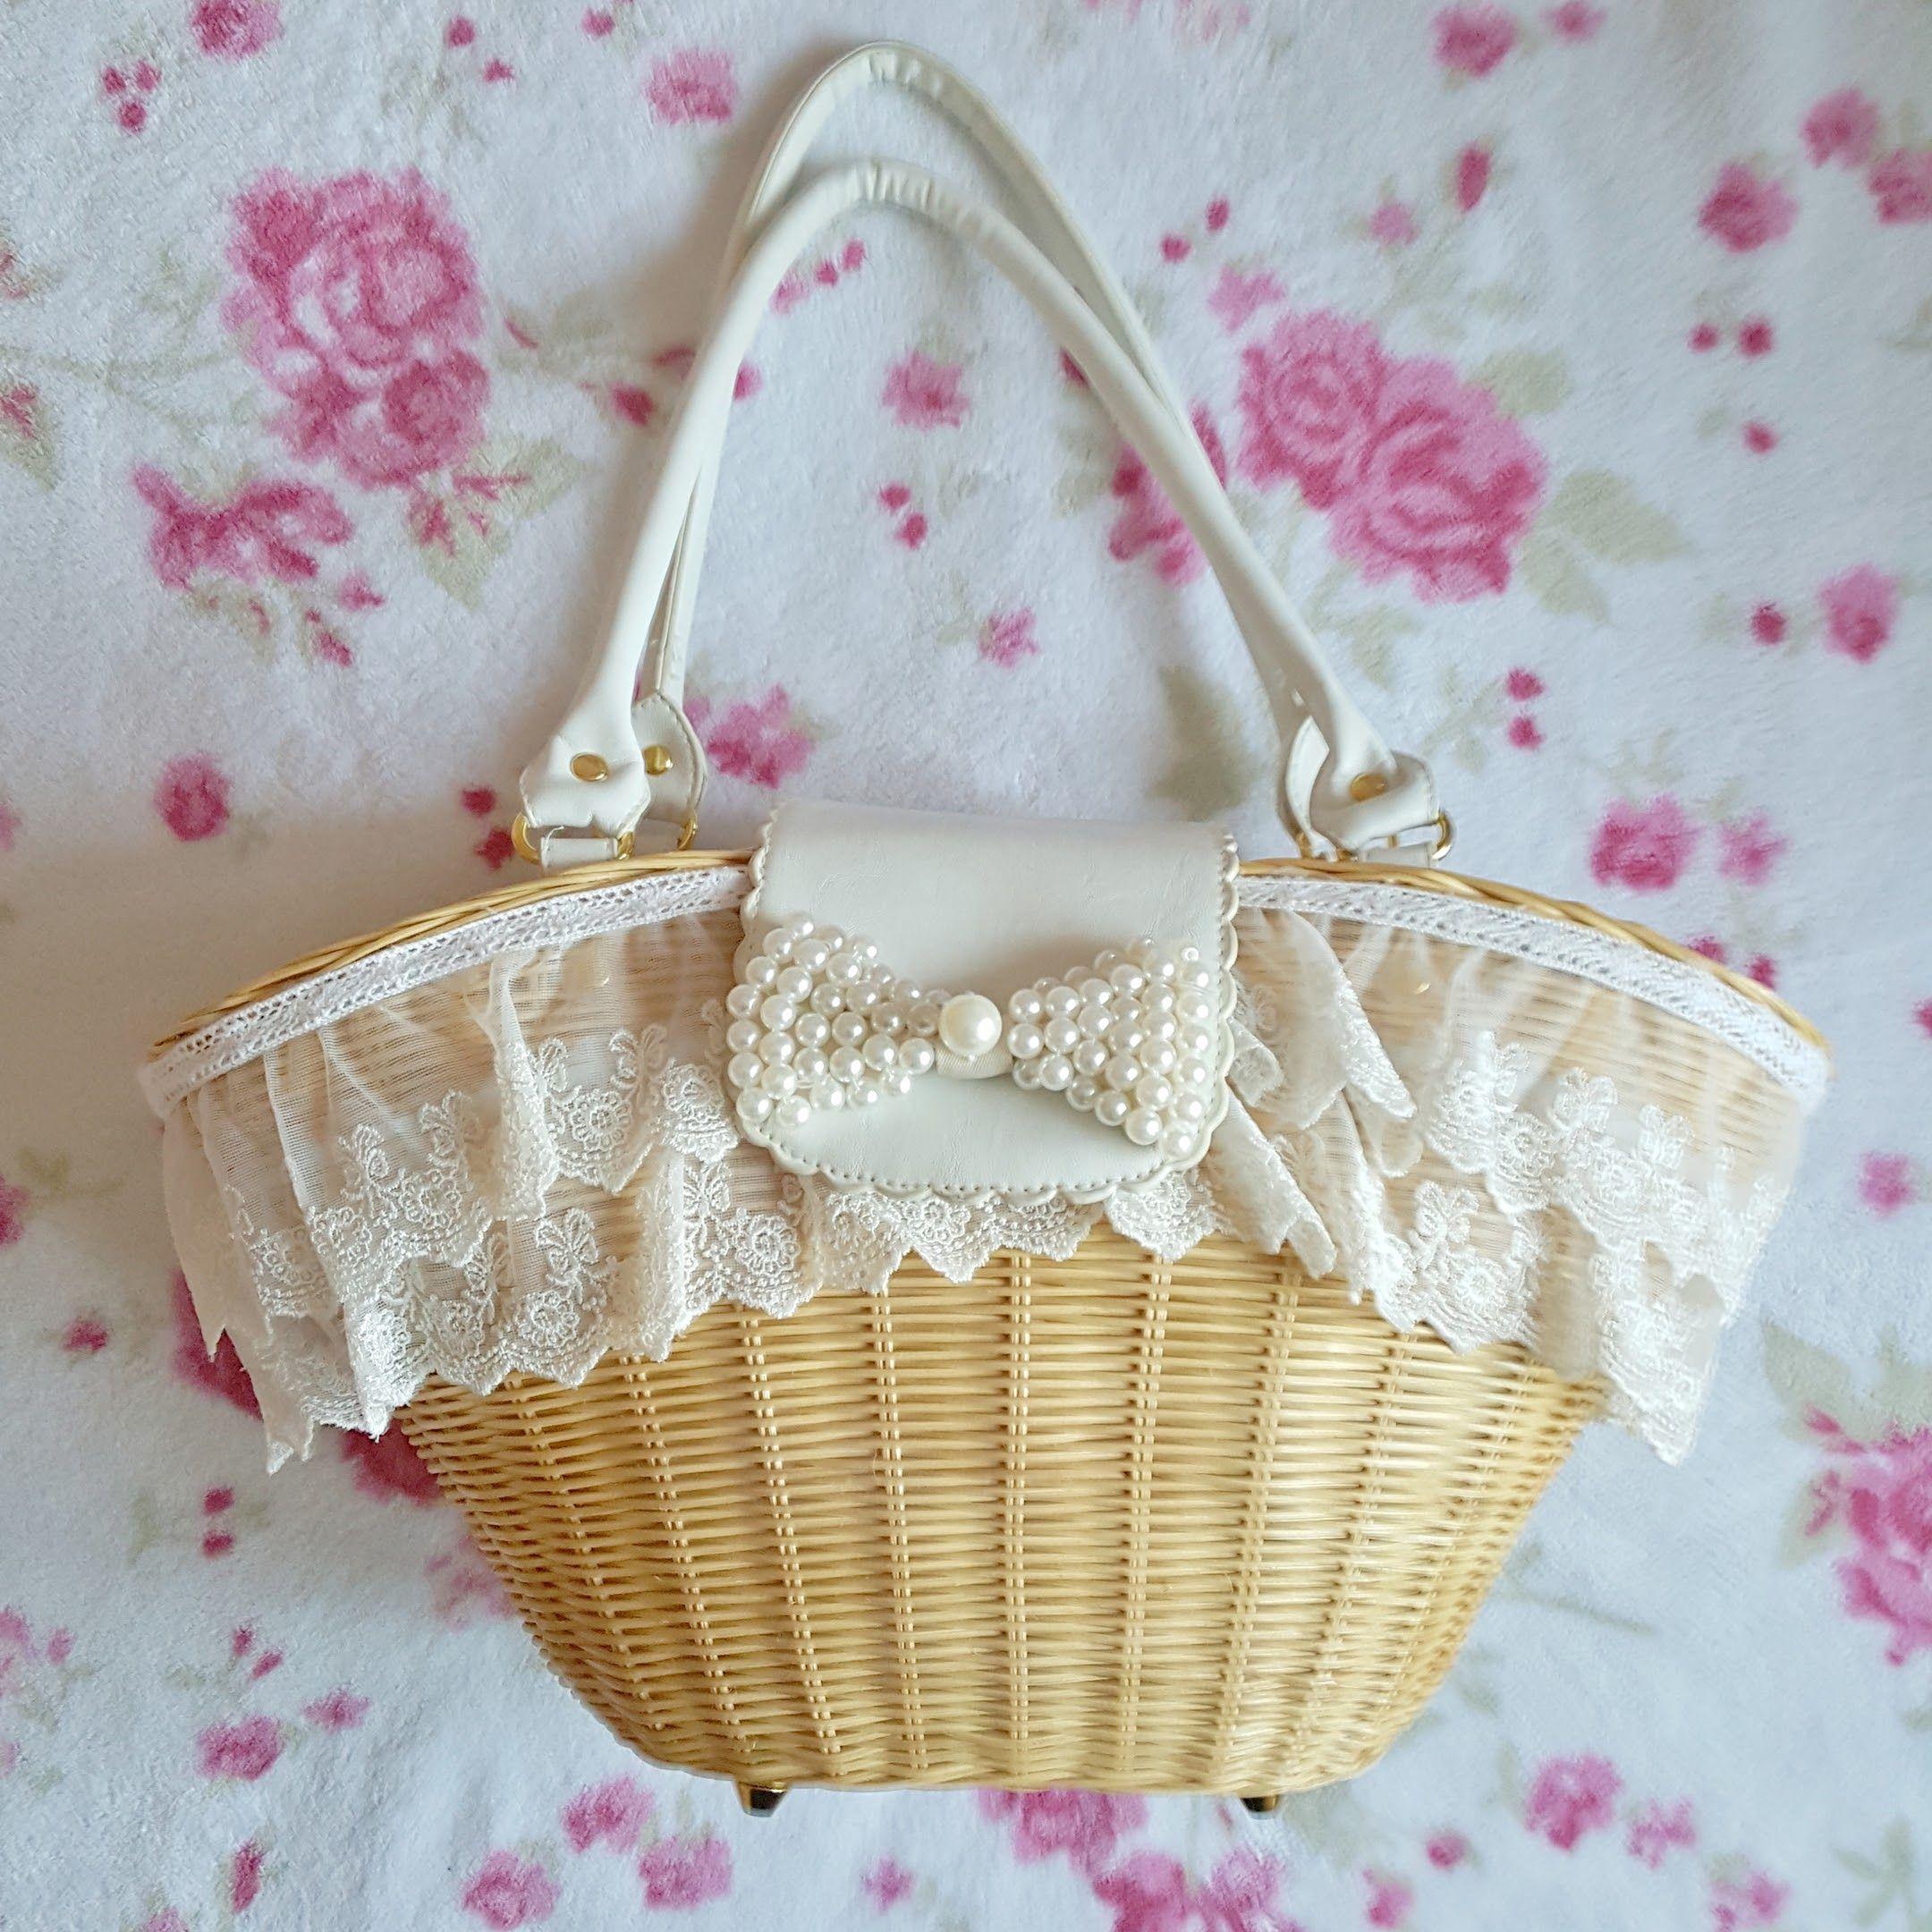 LIZ LISA Lace Beach Woven Basket purse sold by HANAKO